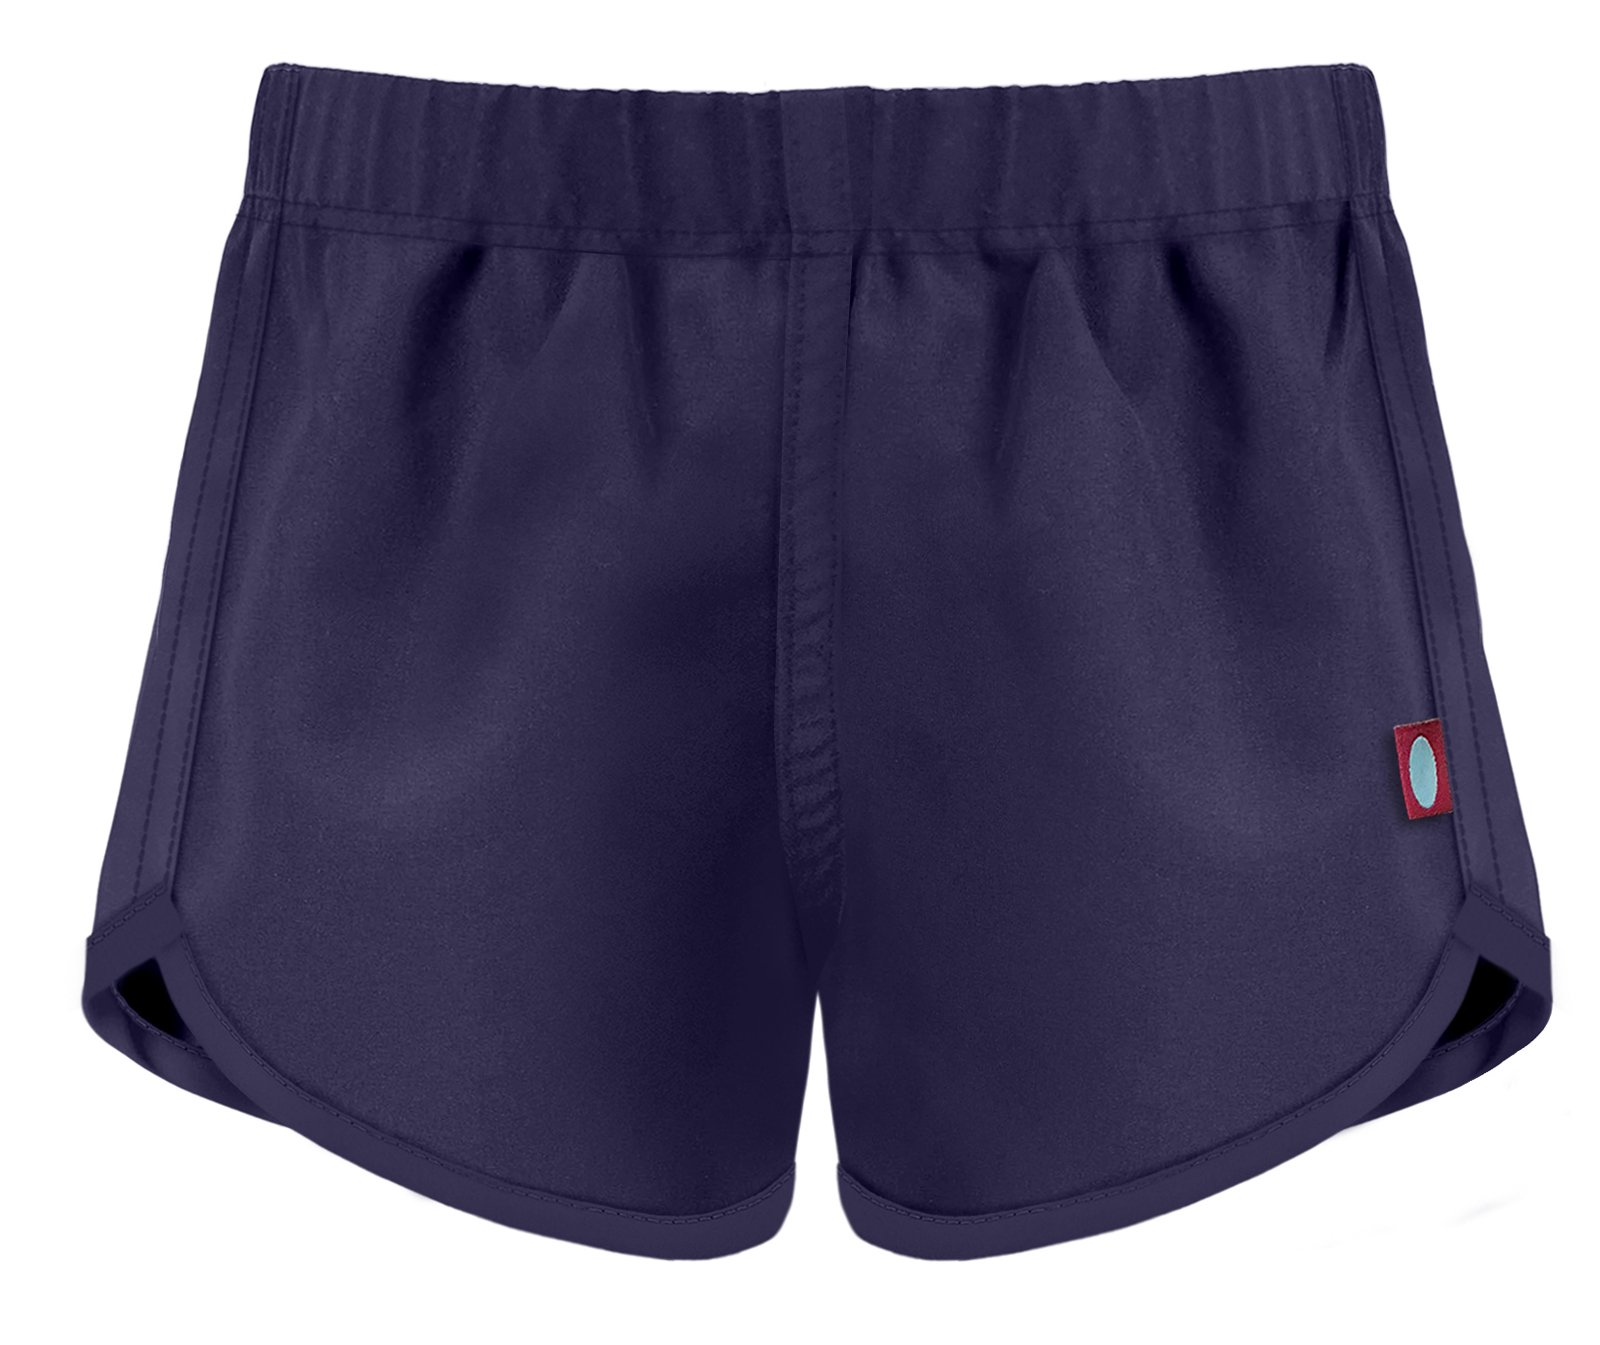 City Threads Girls' Swimming Suit Bottom Board Short, Navy, 6